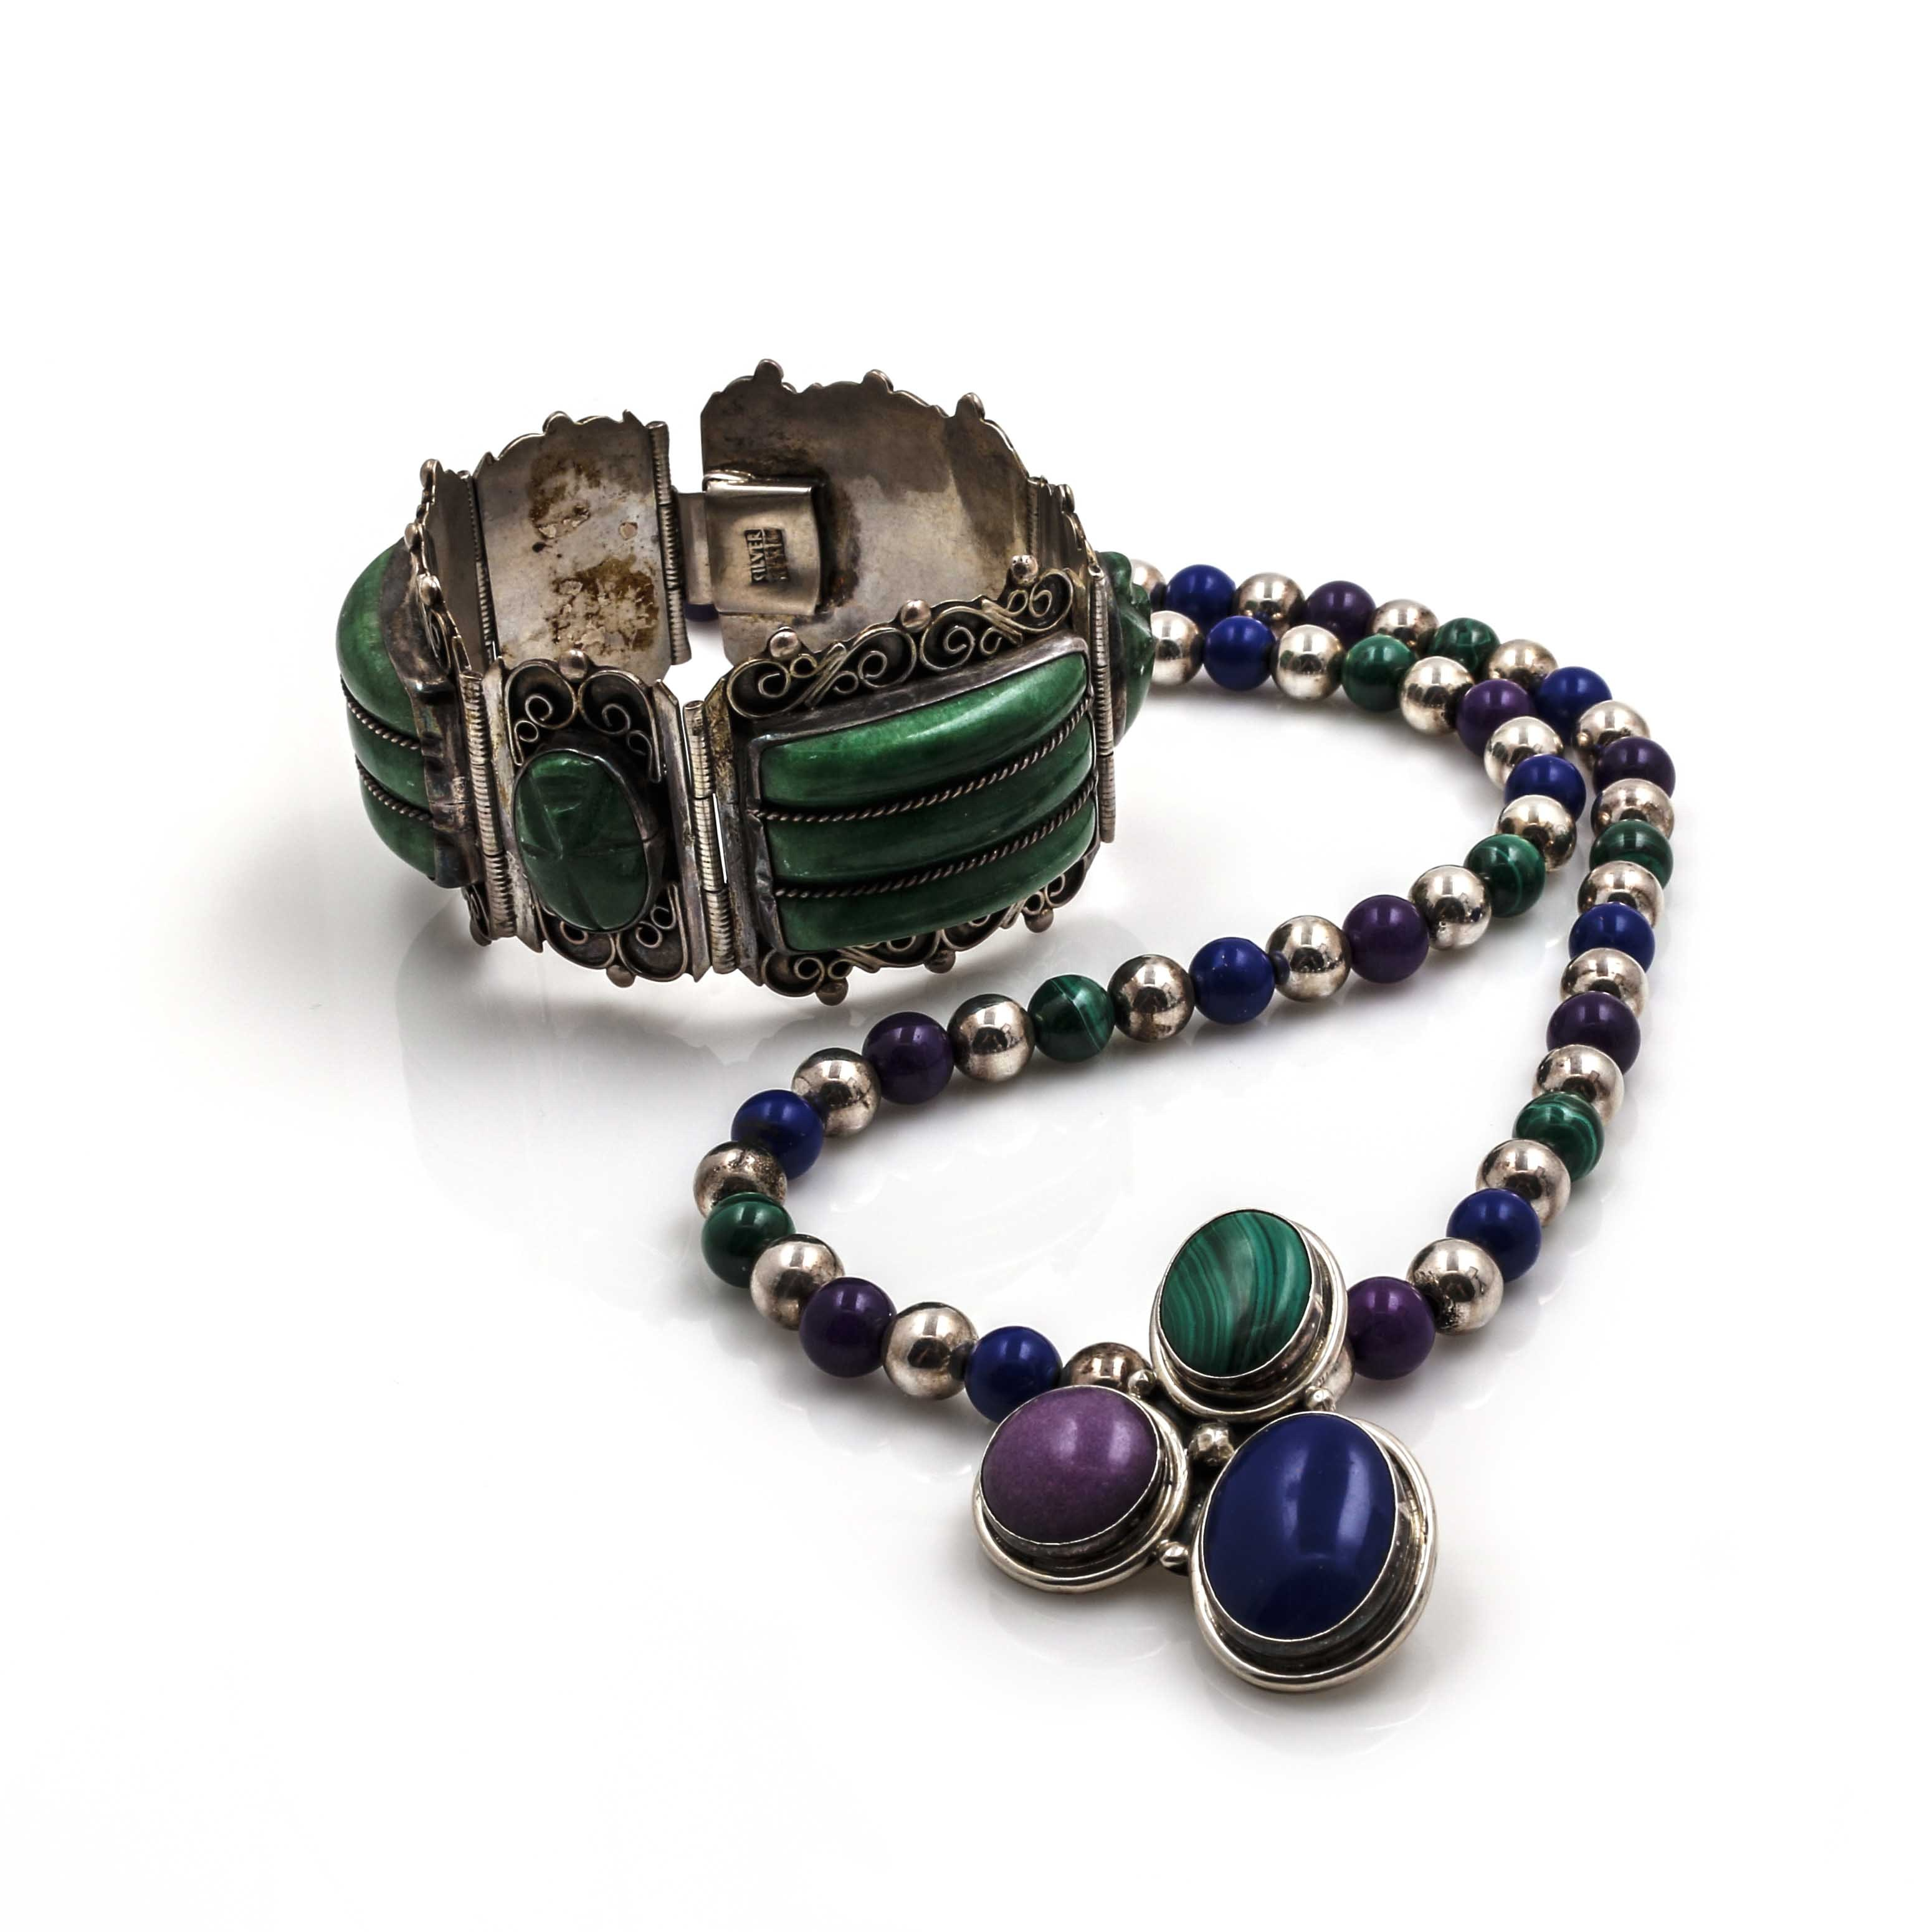 Sterling Silver Semi-Precious Gemstone Bracelet and Necklace